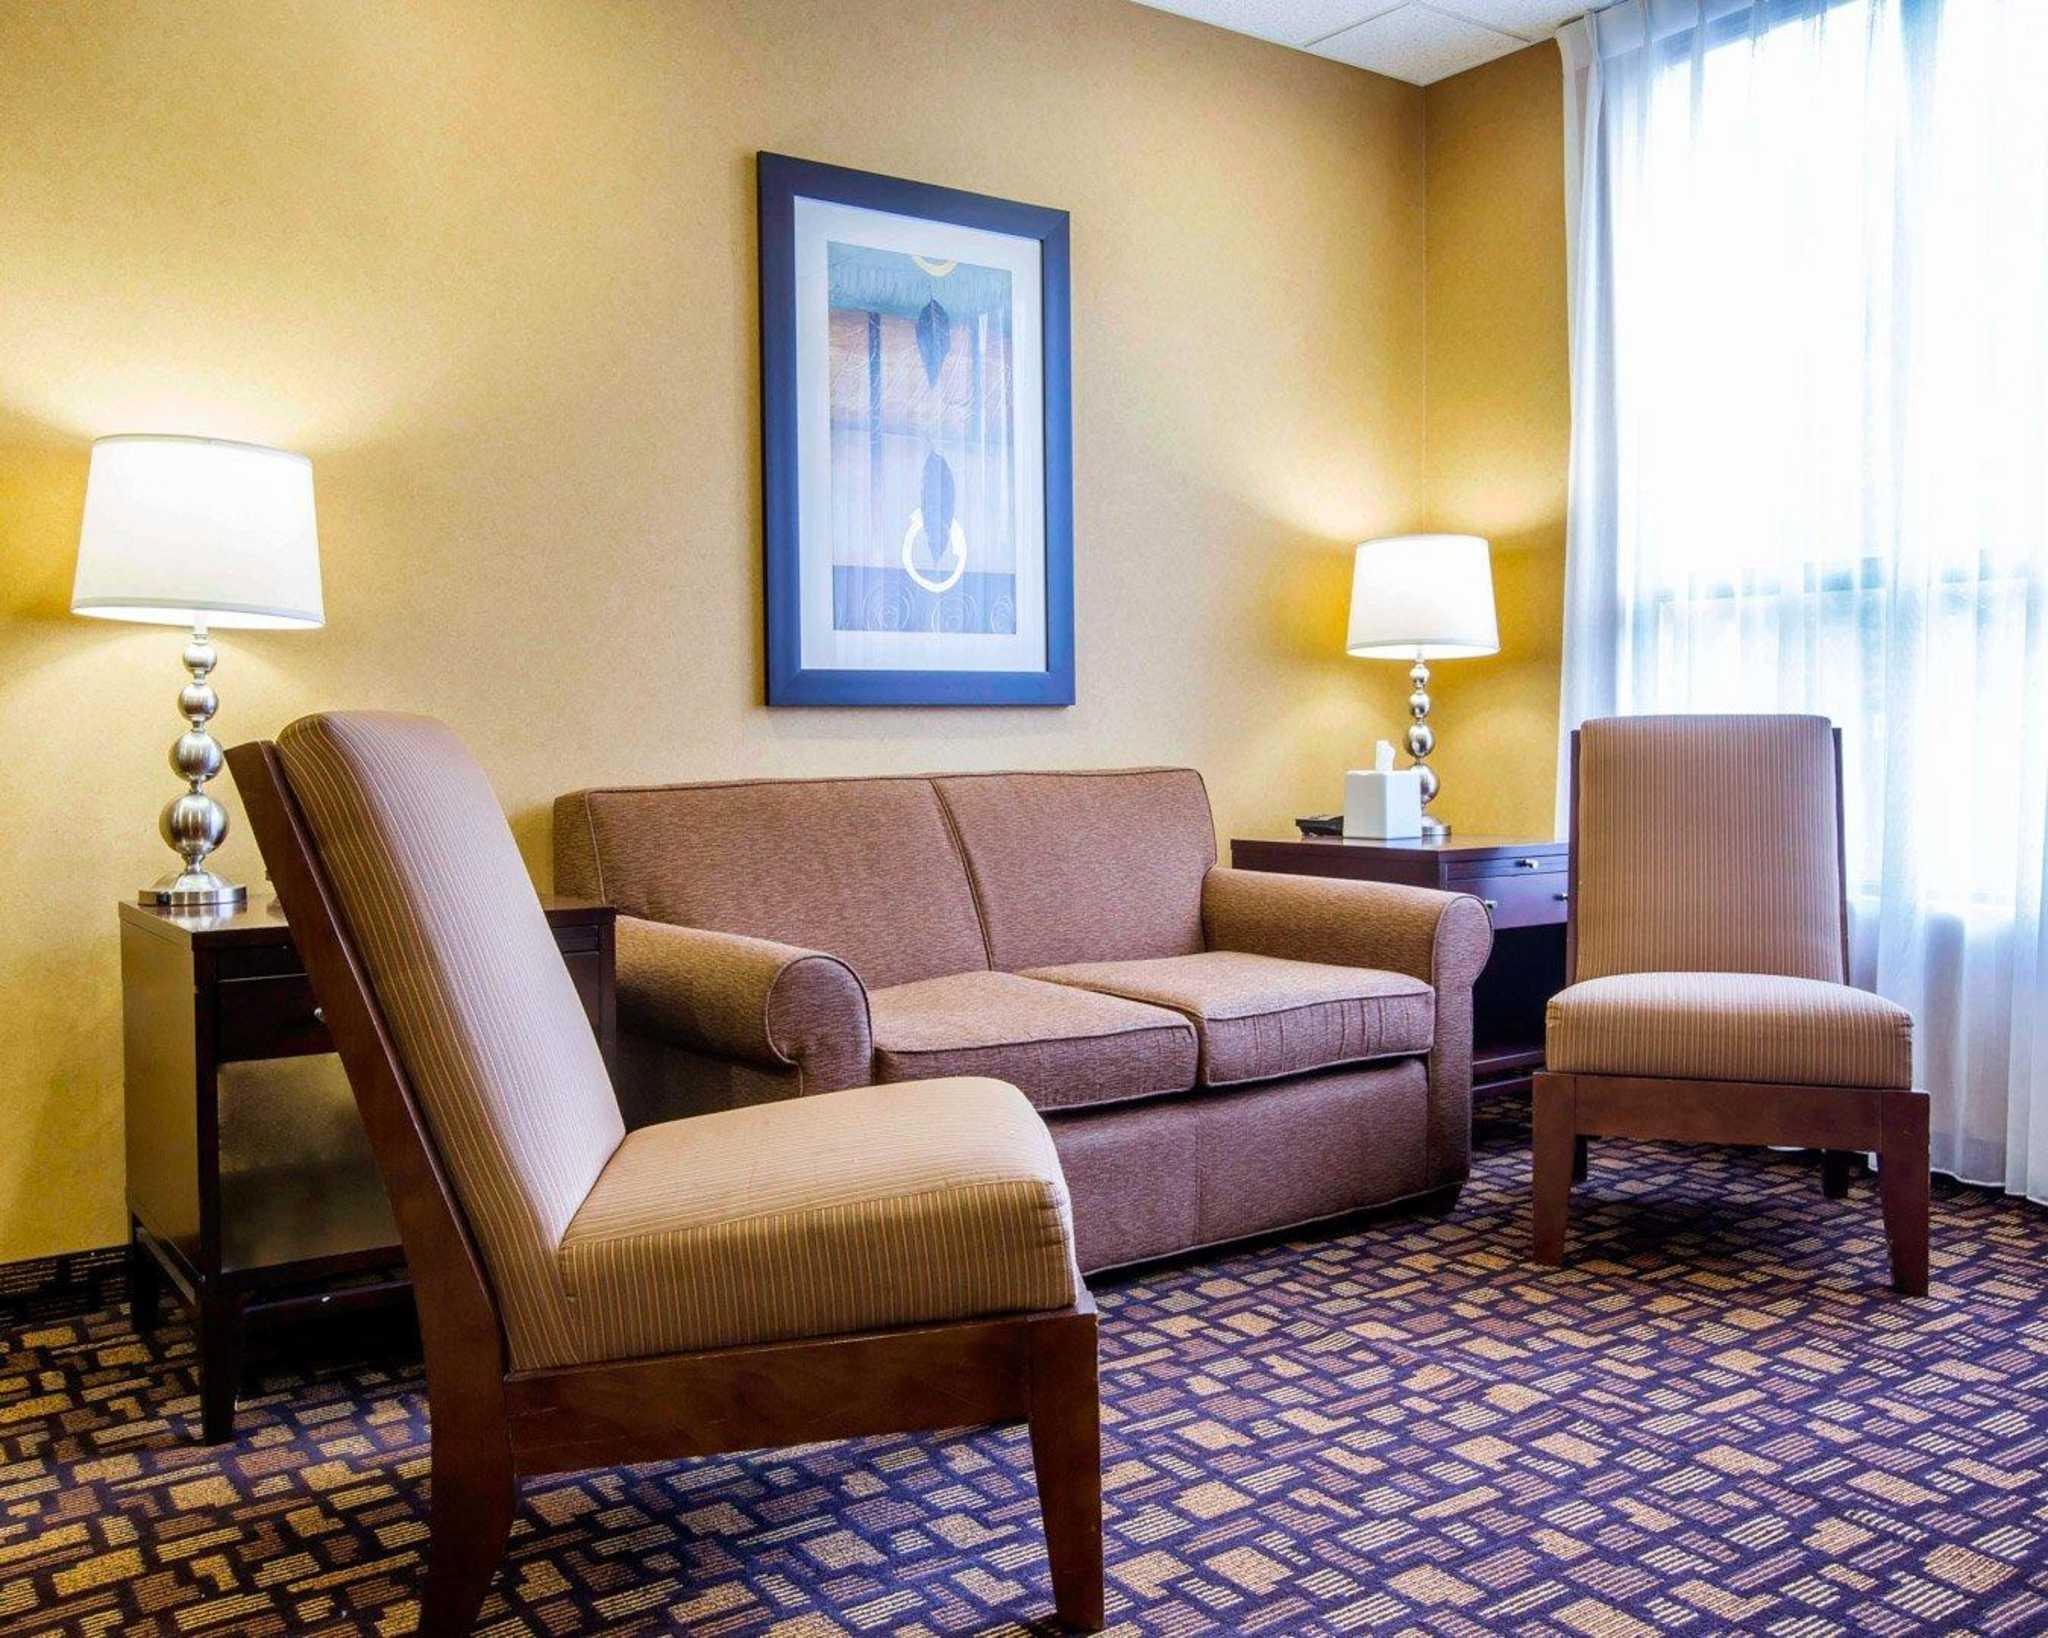 Comfort Inn & Suites adj to Akwesasne Mohawk Casino image 32